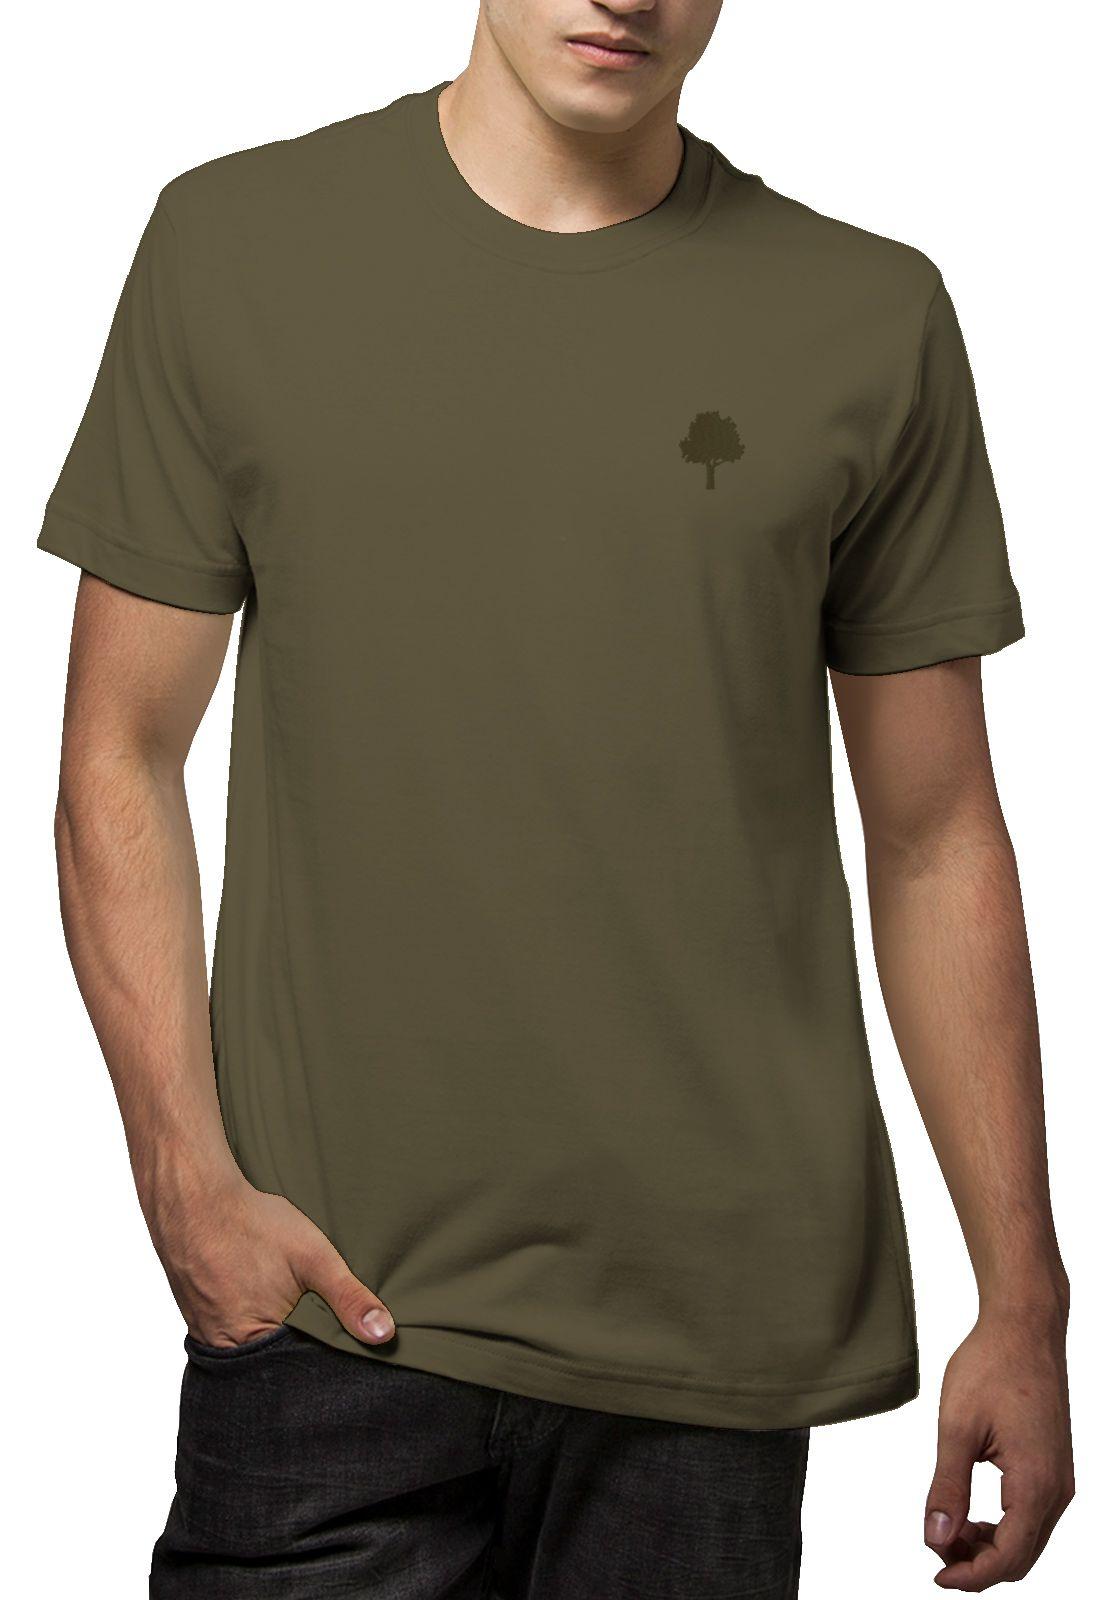 Camiseta Amazônia Básica Árvore Bordada - Verde Escuro